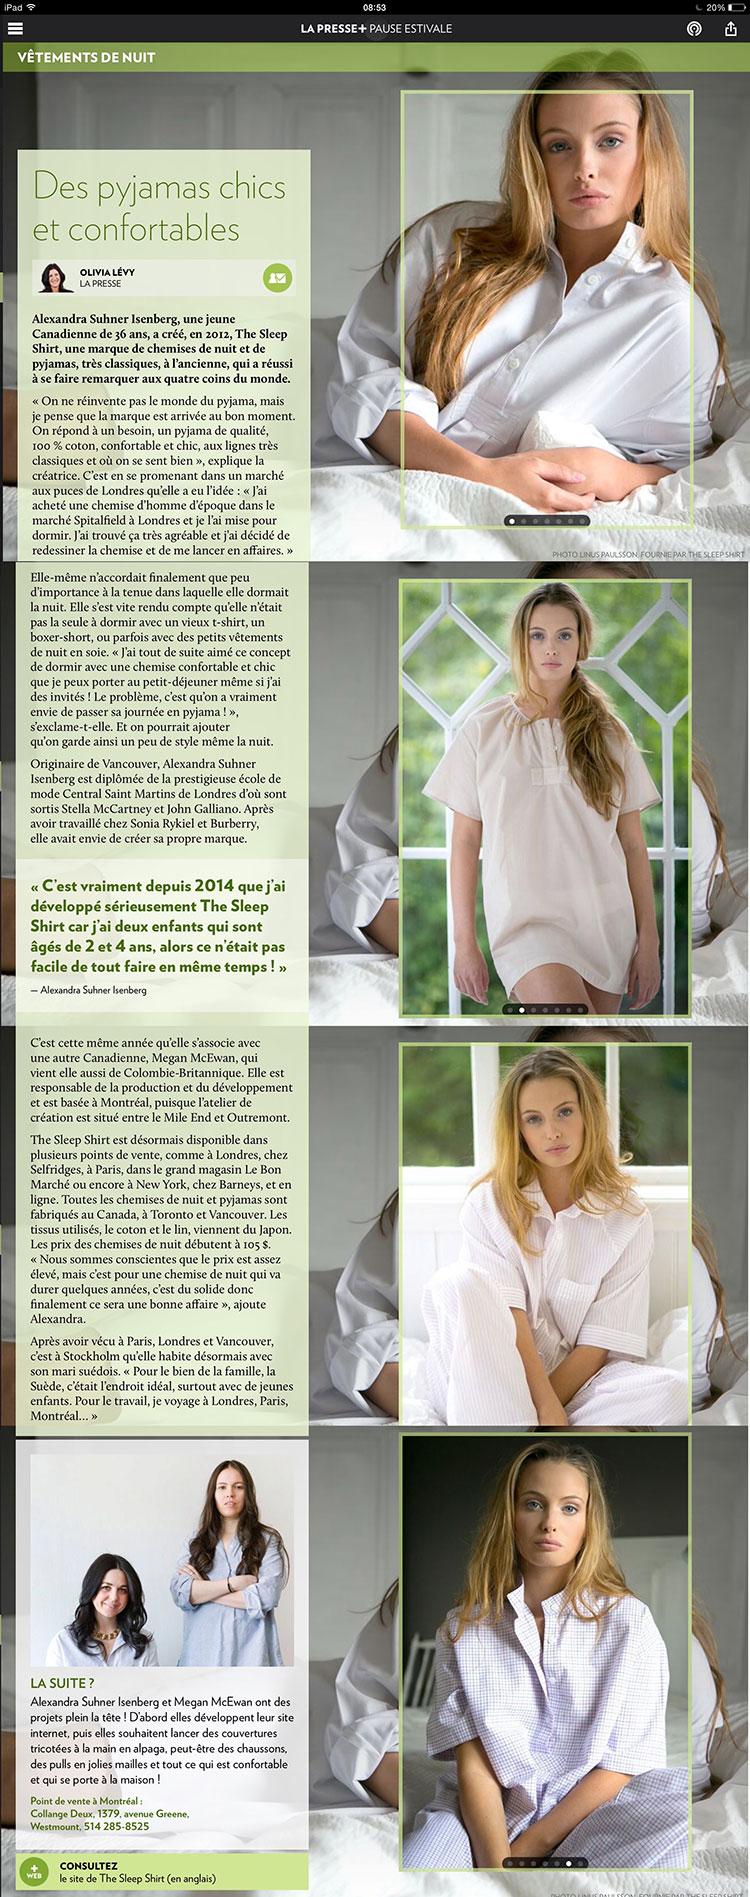 la presse, press, newspeper, the sleep shirt, quebec, canada